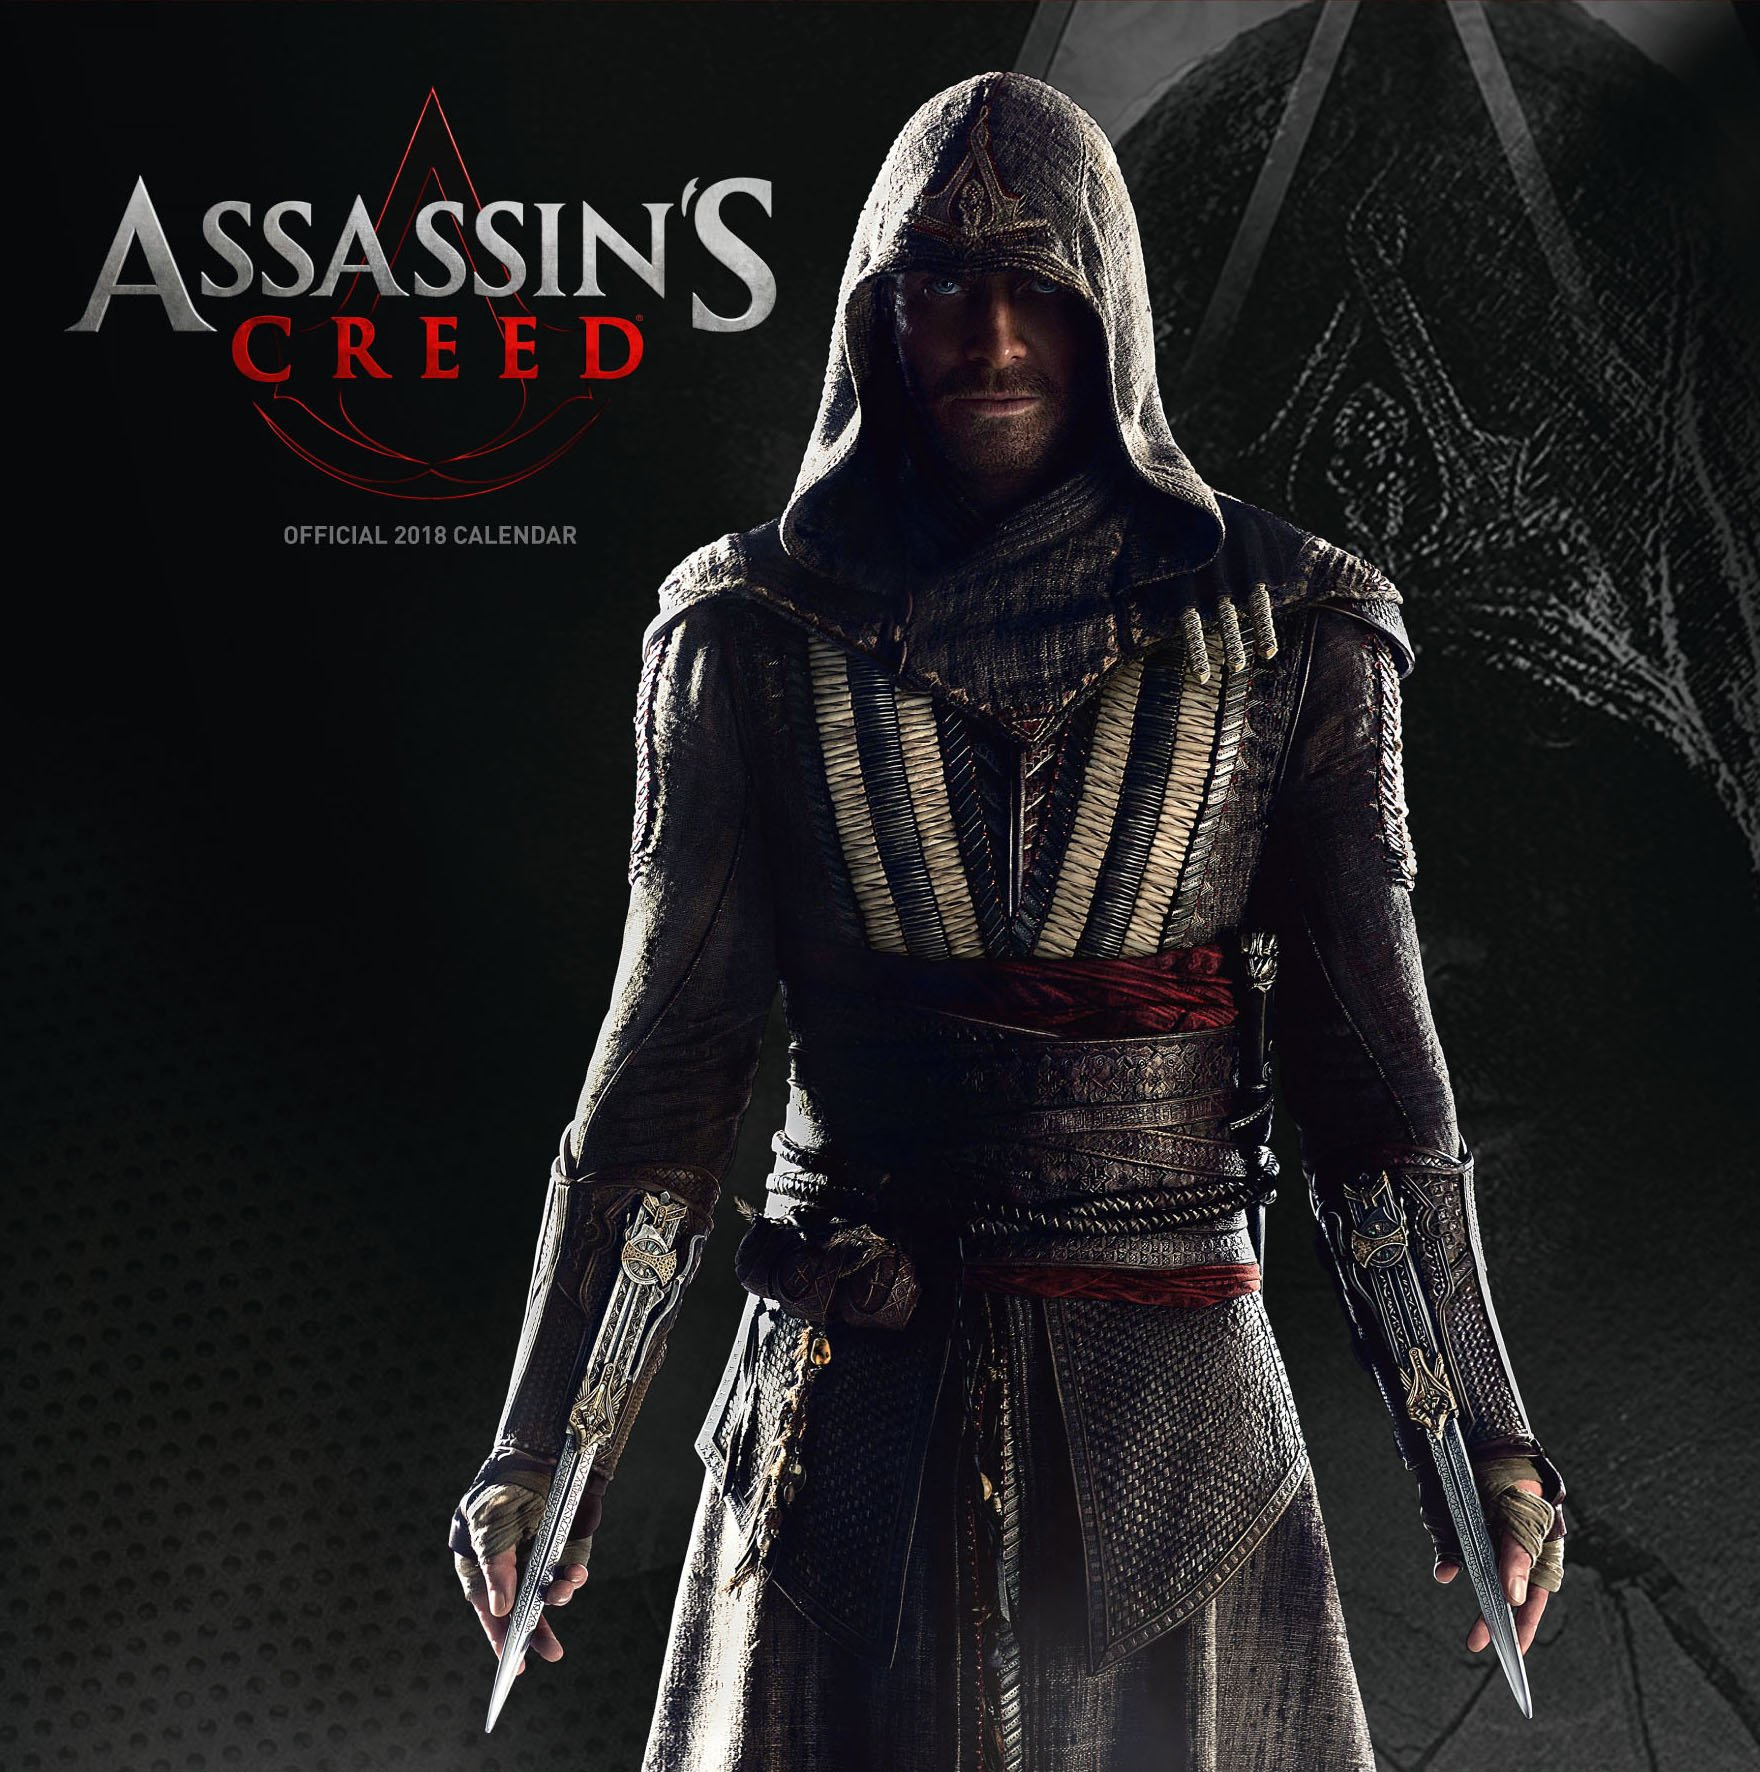 Assassin's Creed Official 2018 Calendar   Square Wall Format  Calendar 2018